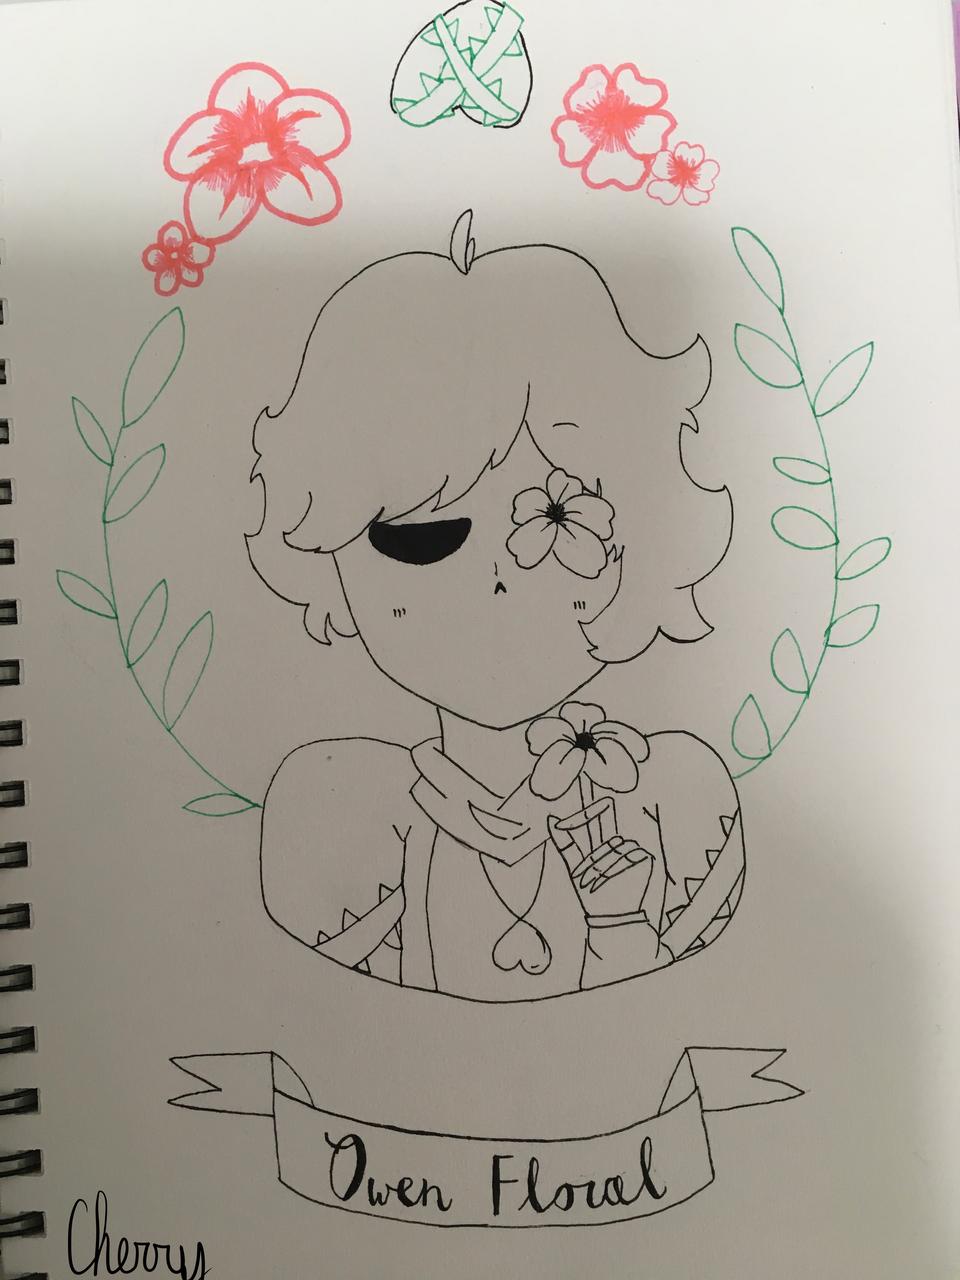 Owen floral doodle :) Illust of Cherry 🍒 (skid mode) oc doodle newoc medibangpaint